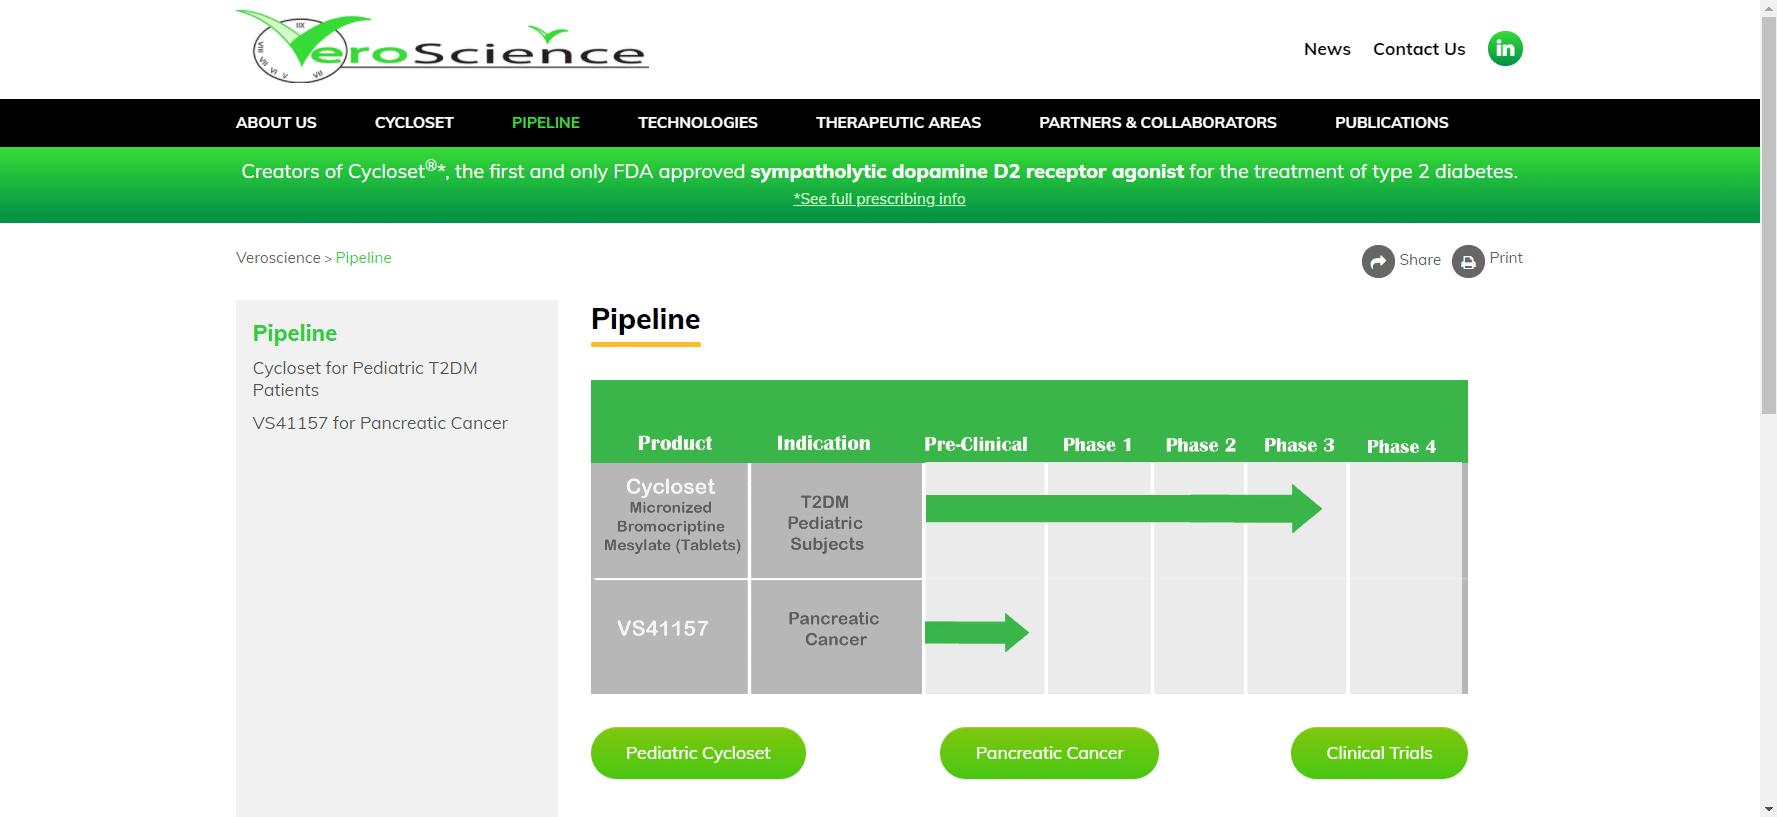 VeroScience Biotechnology Company Website